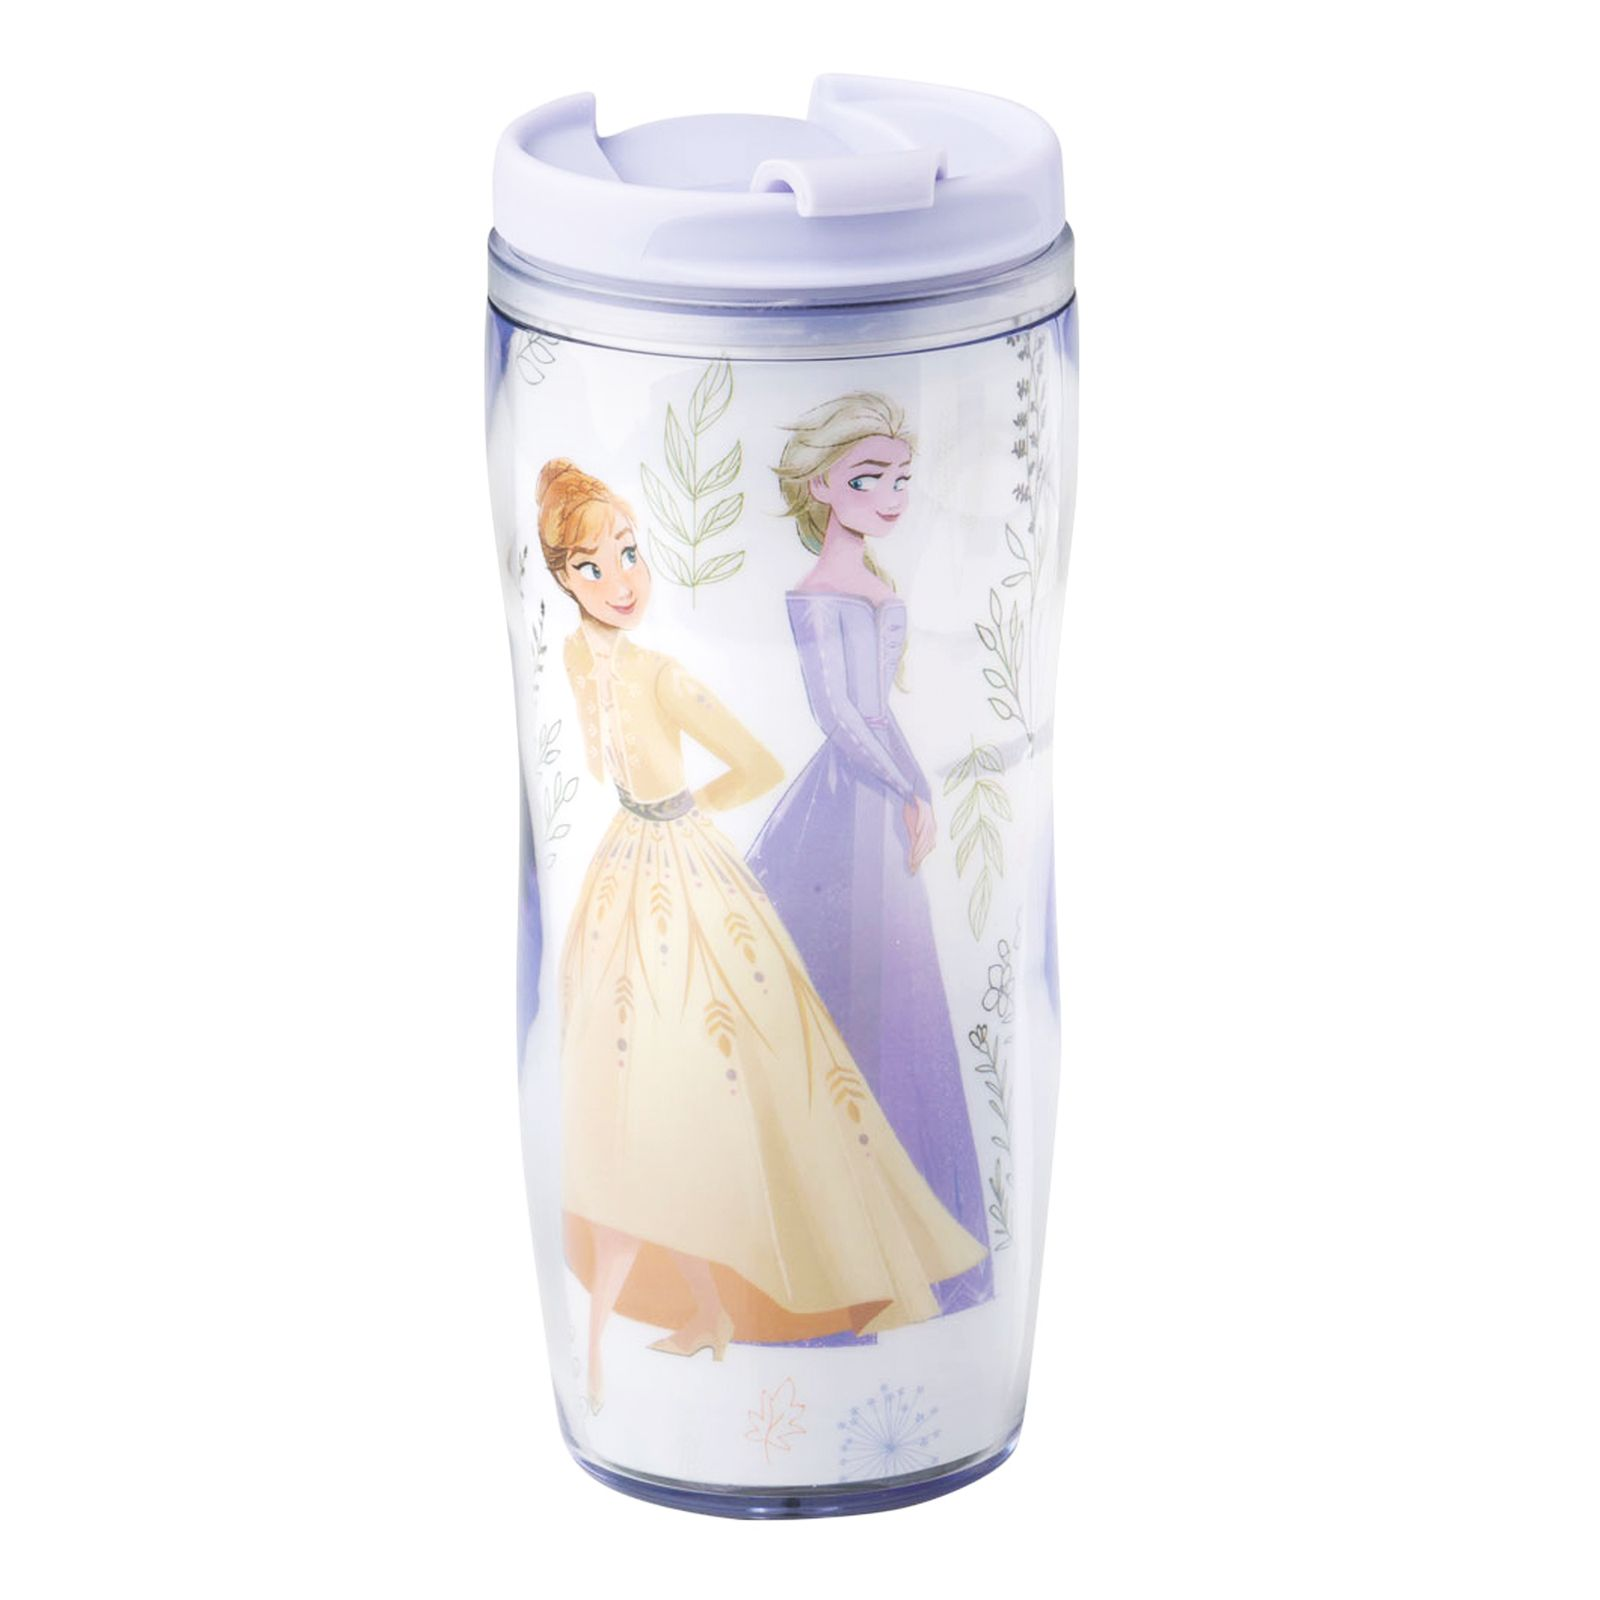 Hrnek / láhev s výměnnou grafikou Frozen II Herbal 400 ml DISNEY